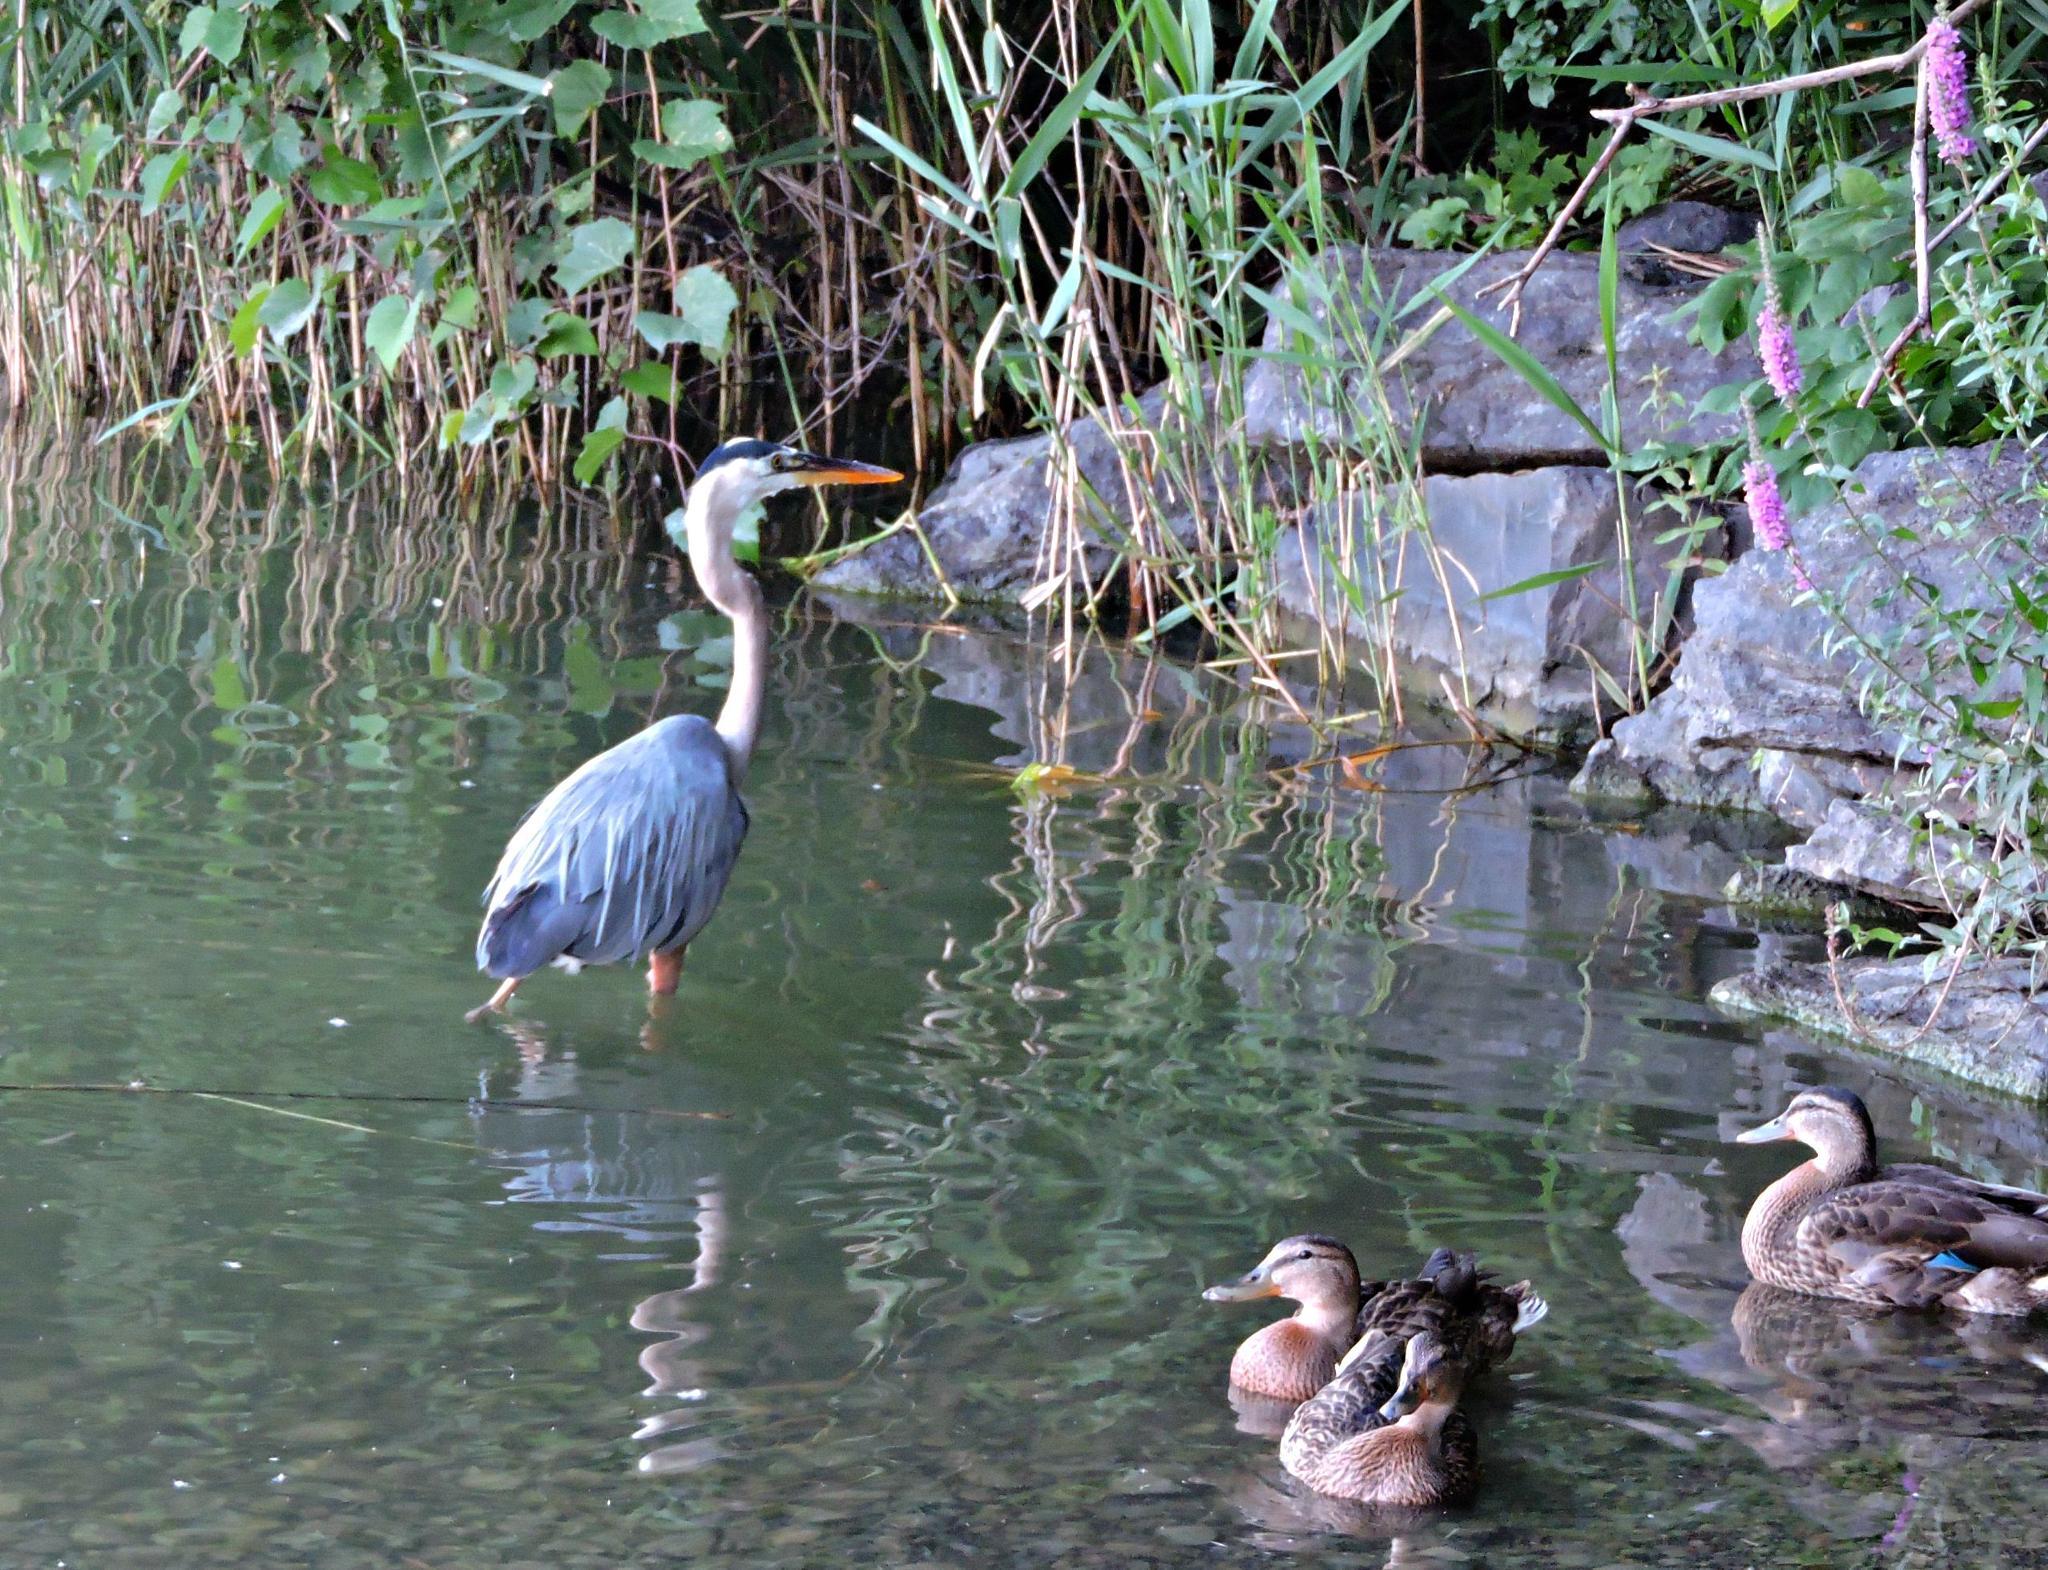 Heron and Ducks  by Janice Bradford